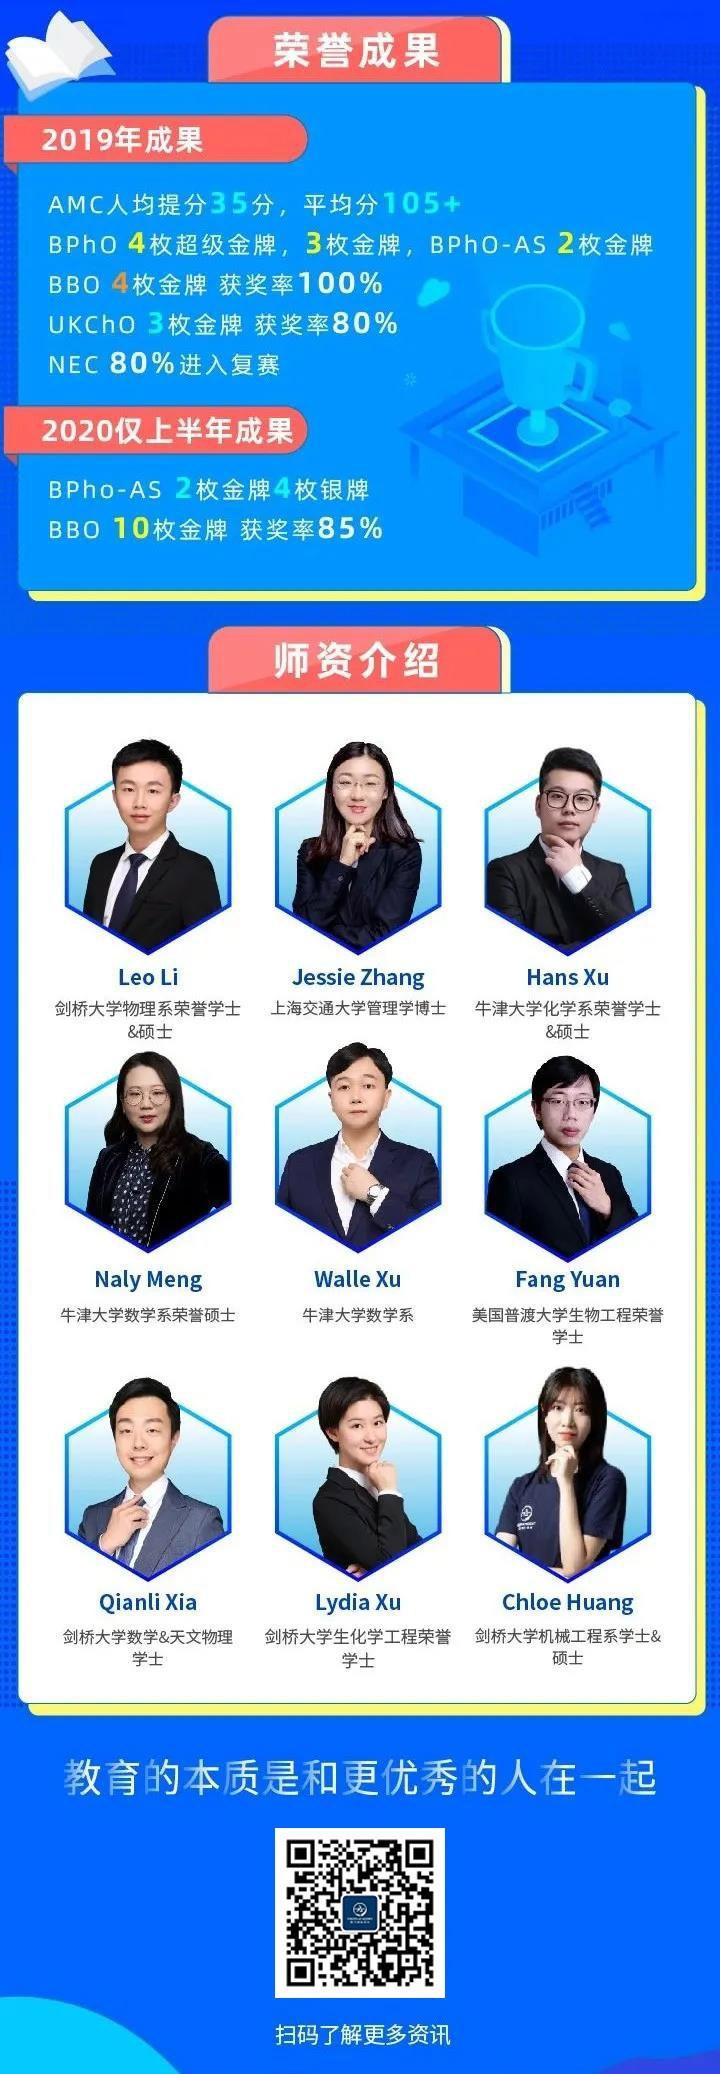 ukcho什么时候出成绩 4月19日金奖放榜了内容图片_9